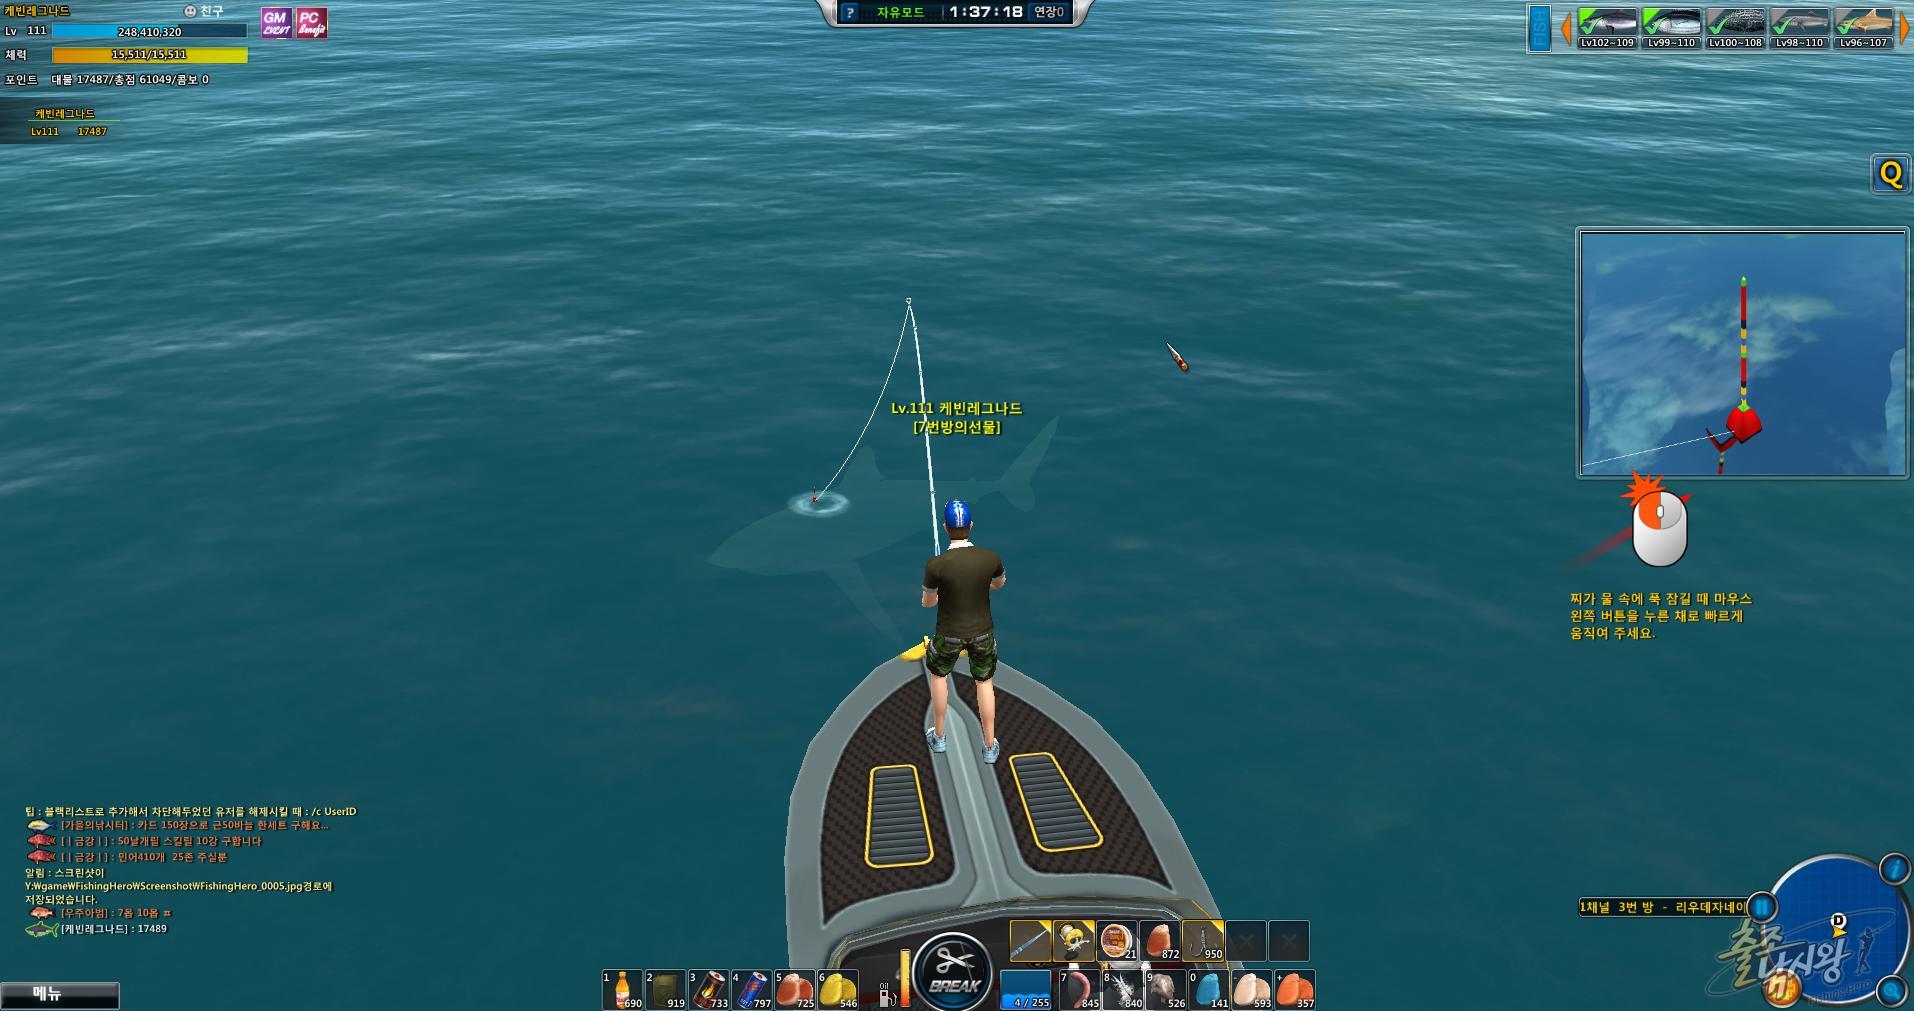 FishingHero_0006.jpg